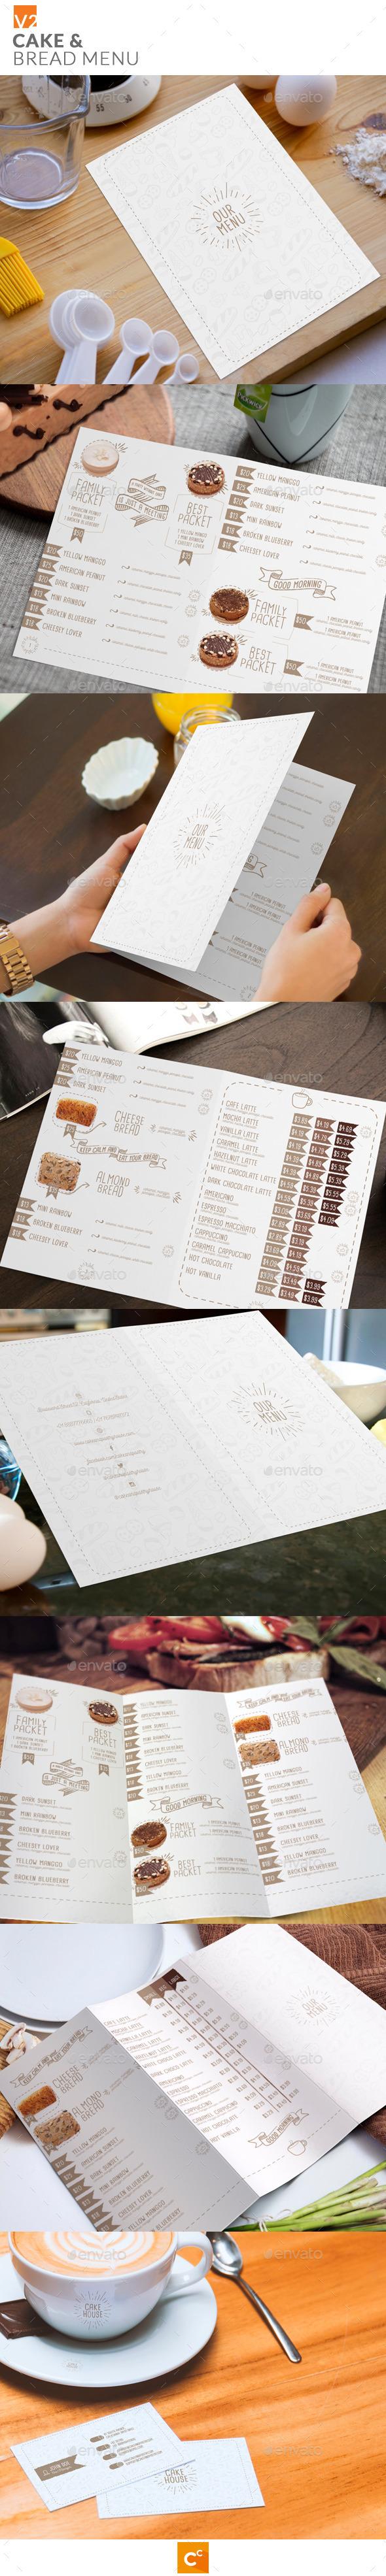 GraphicRiver Cake & Bread Menu v2 11370393